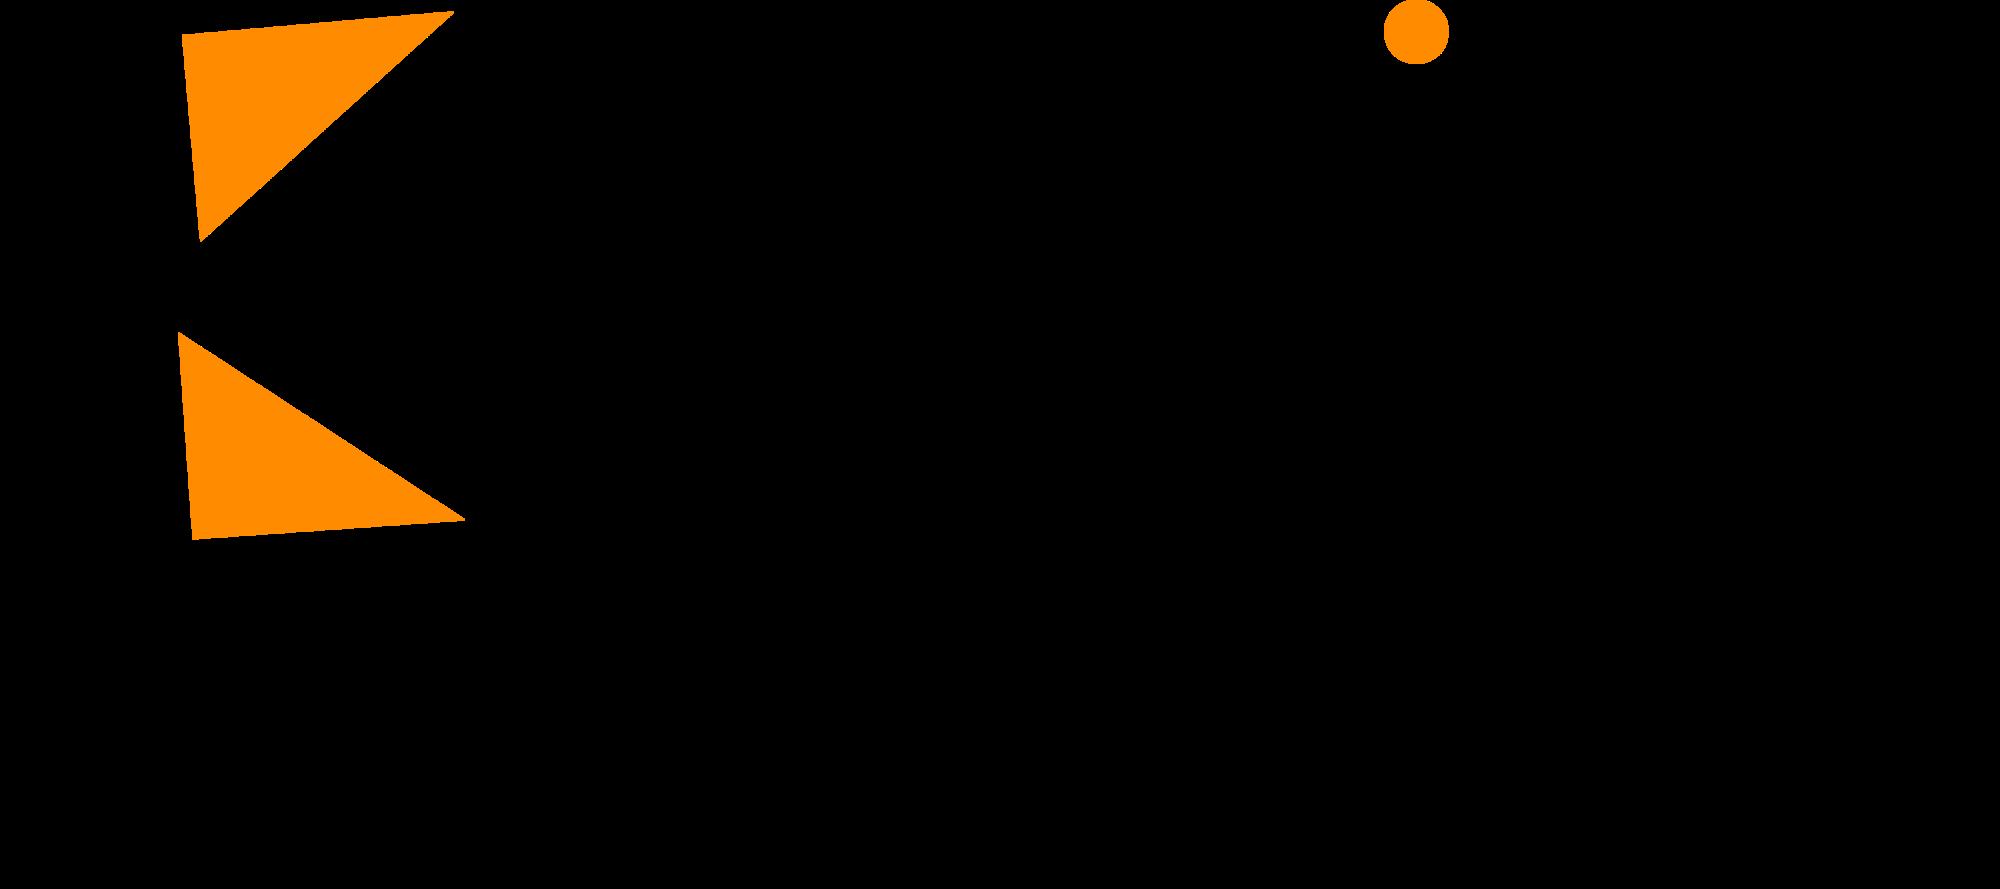 Kj logo rgb im Bistum Passau4